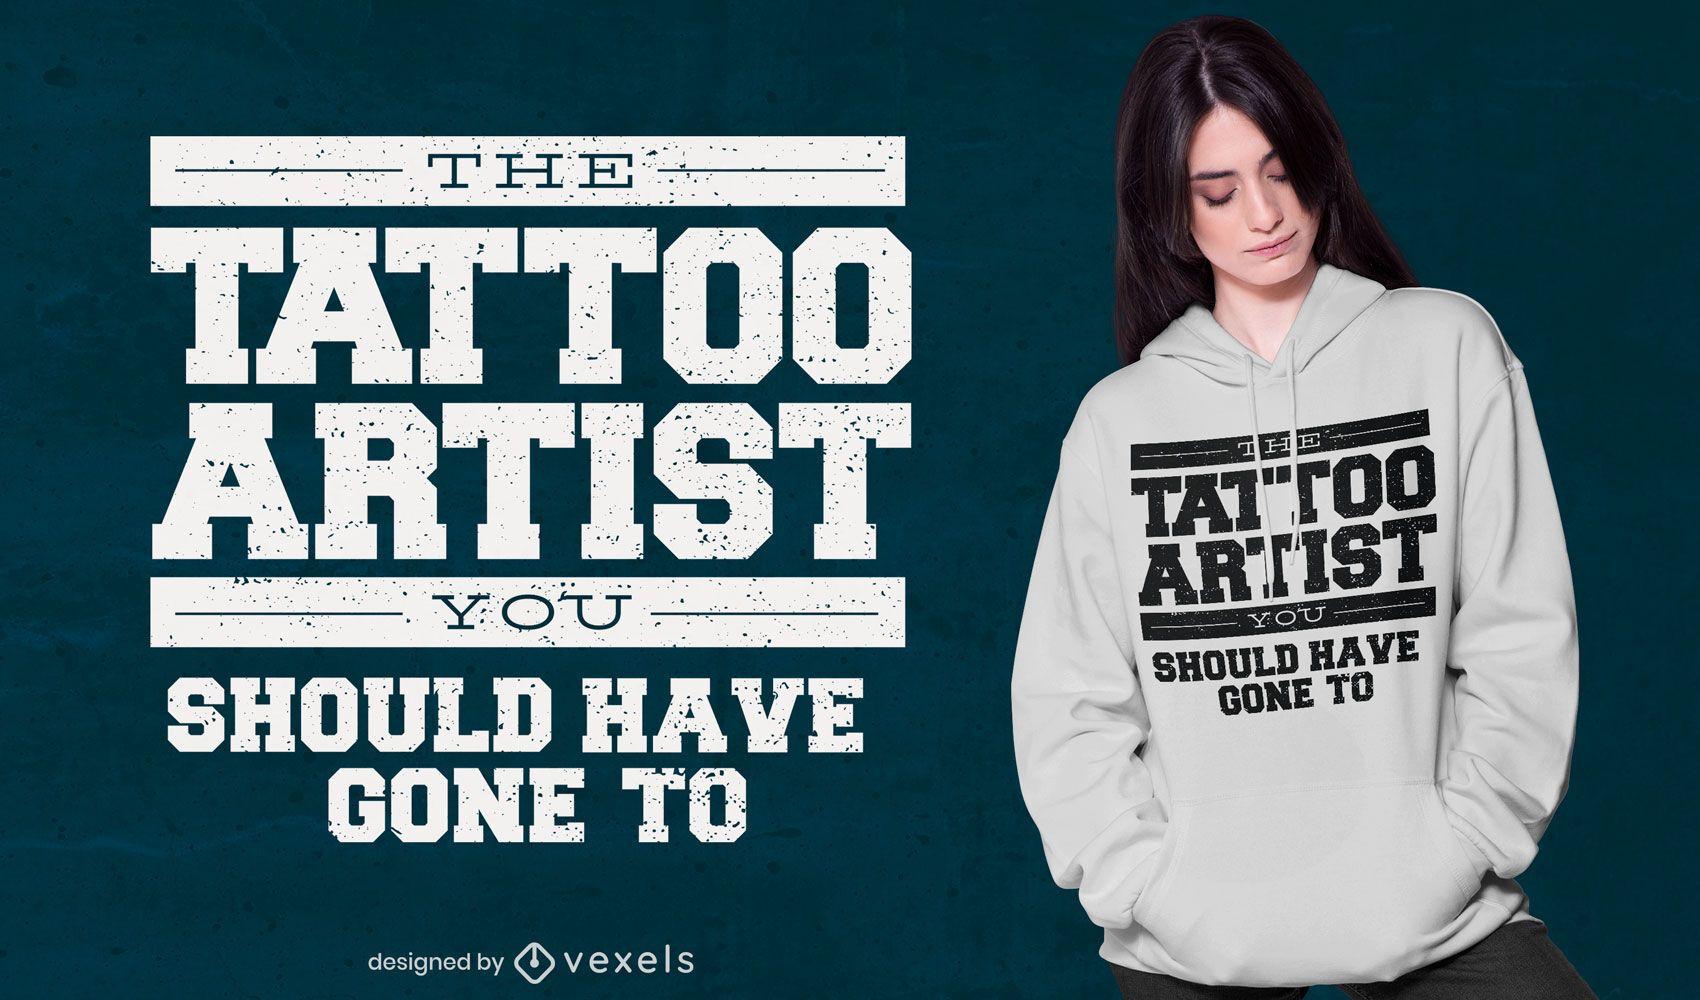 Diseño correcto de la camiseta del artista del tatuaje.